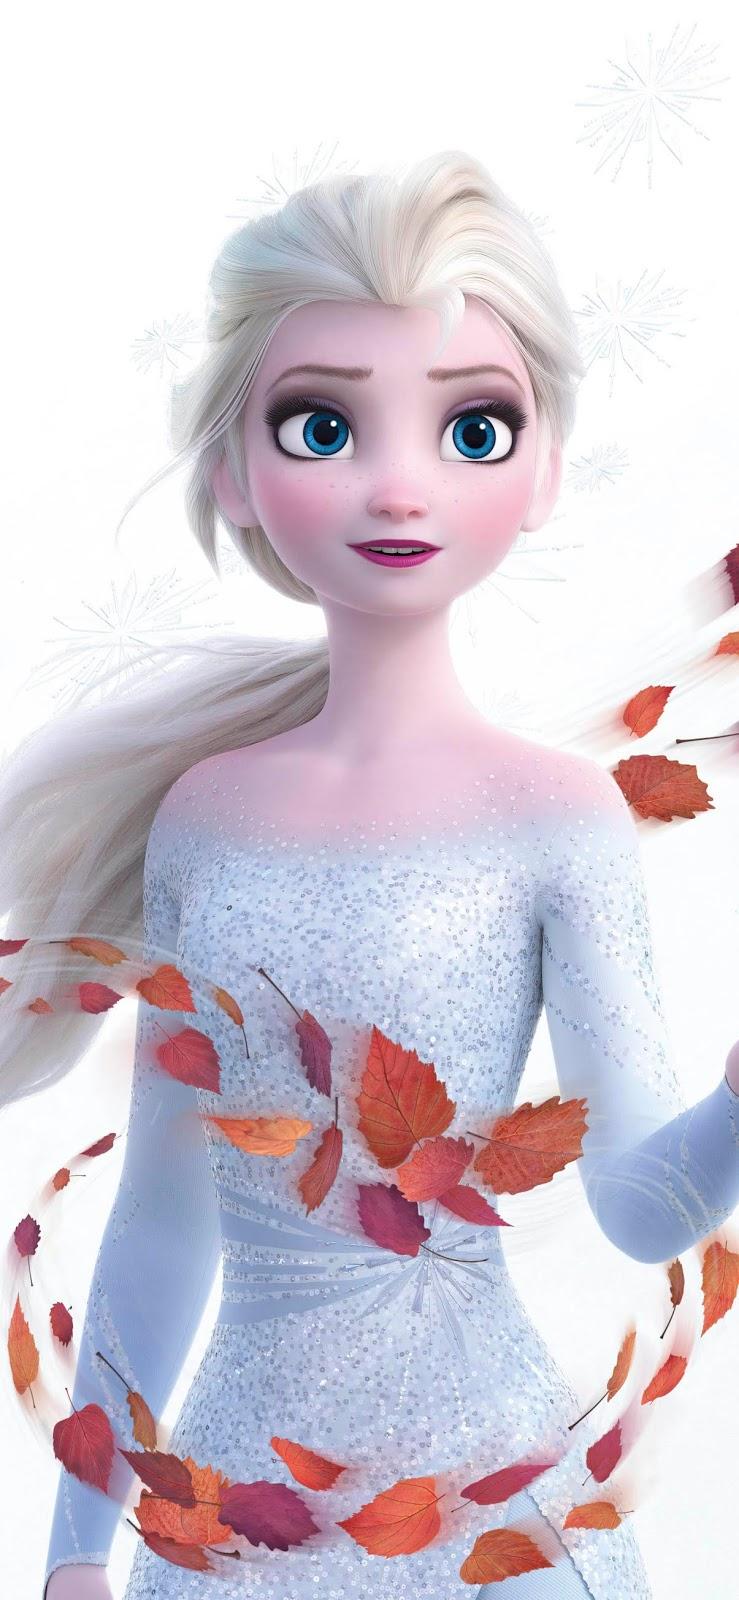 Elsa mobile wallpaper